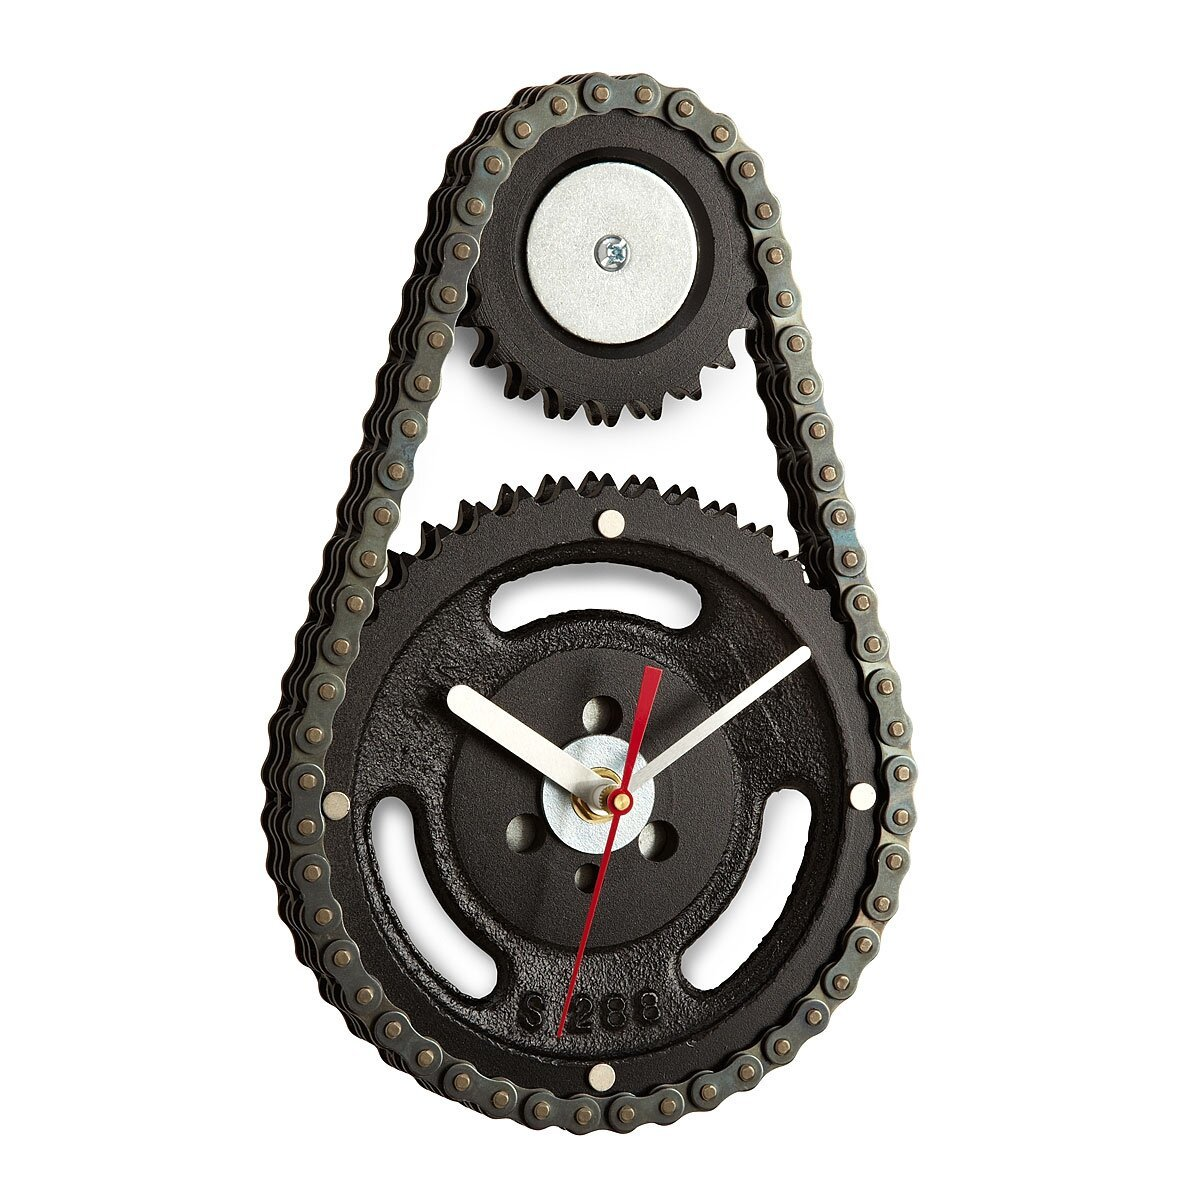 Beautiful Creative Clock Designs!